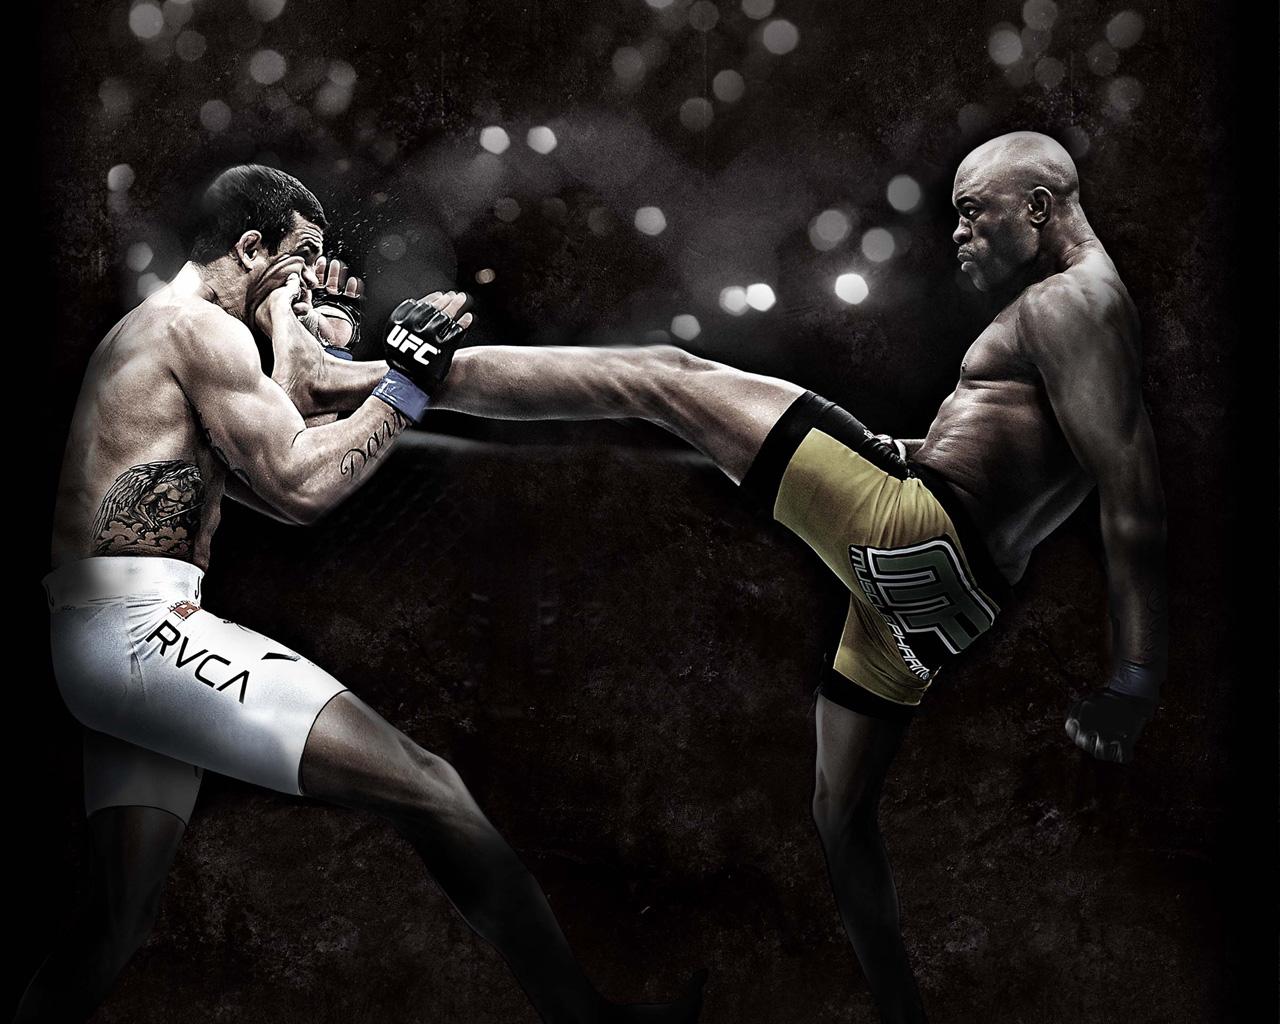 ufc ultimate fighting championship mma mixed martial arts wallpaper 1280x1024